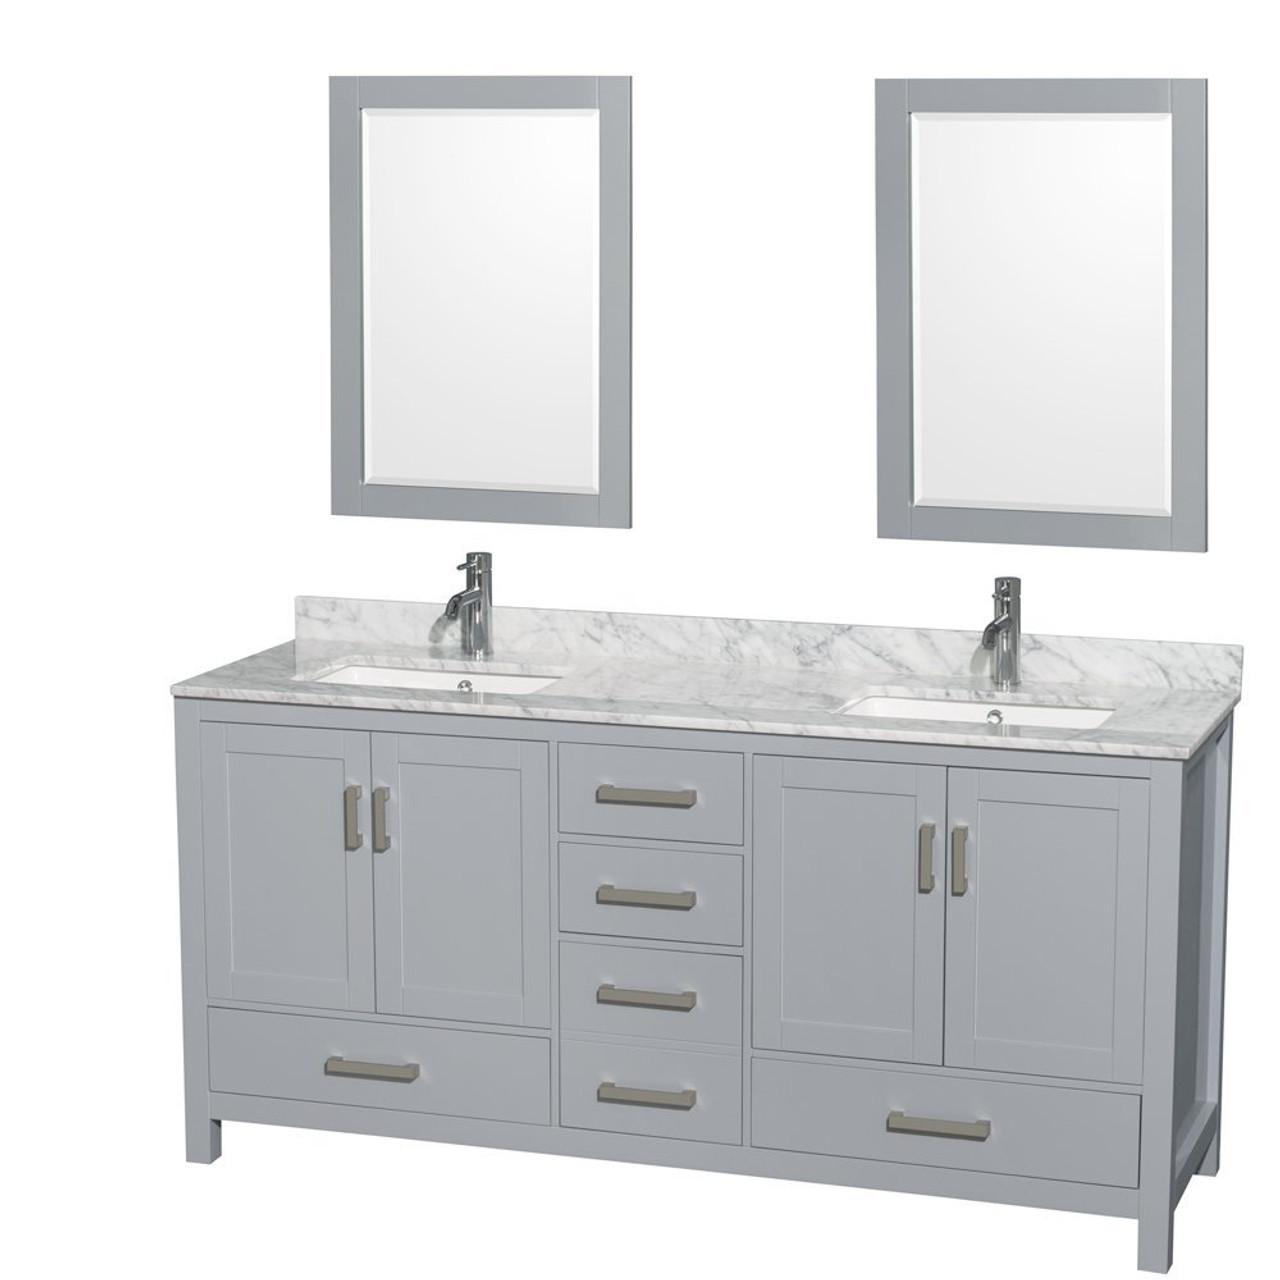 Armada 72 Double Sink Bathroom Vanity Light Grey York Taps